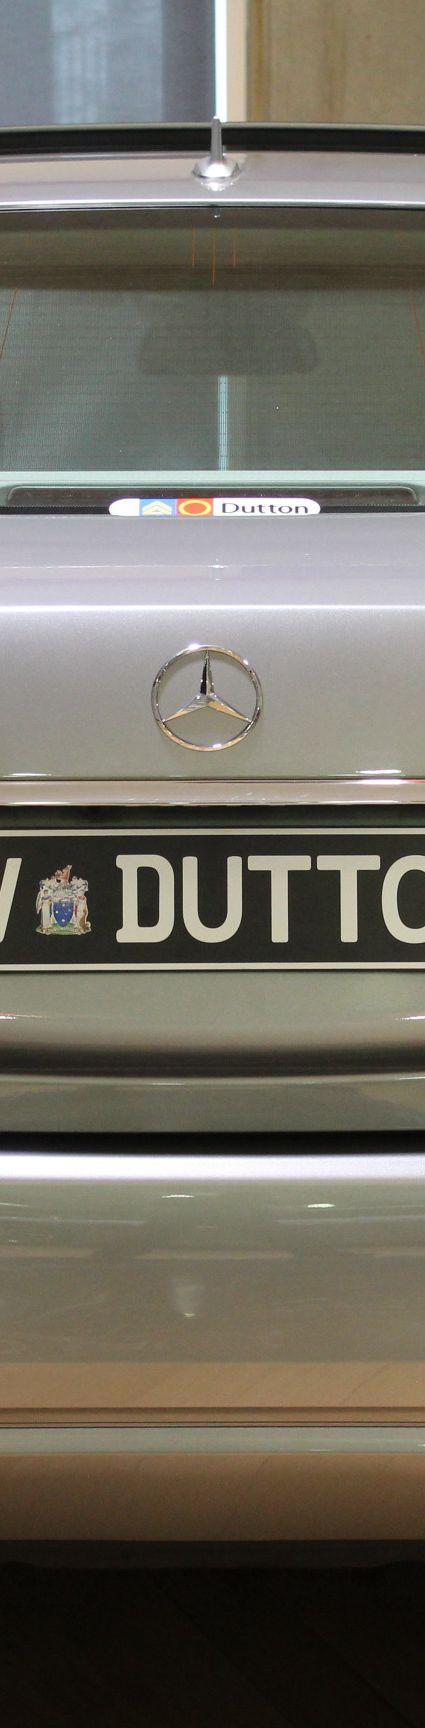 2010 MERCEDES S350 W221 - prestige car for sale in australia